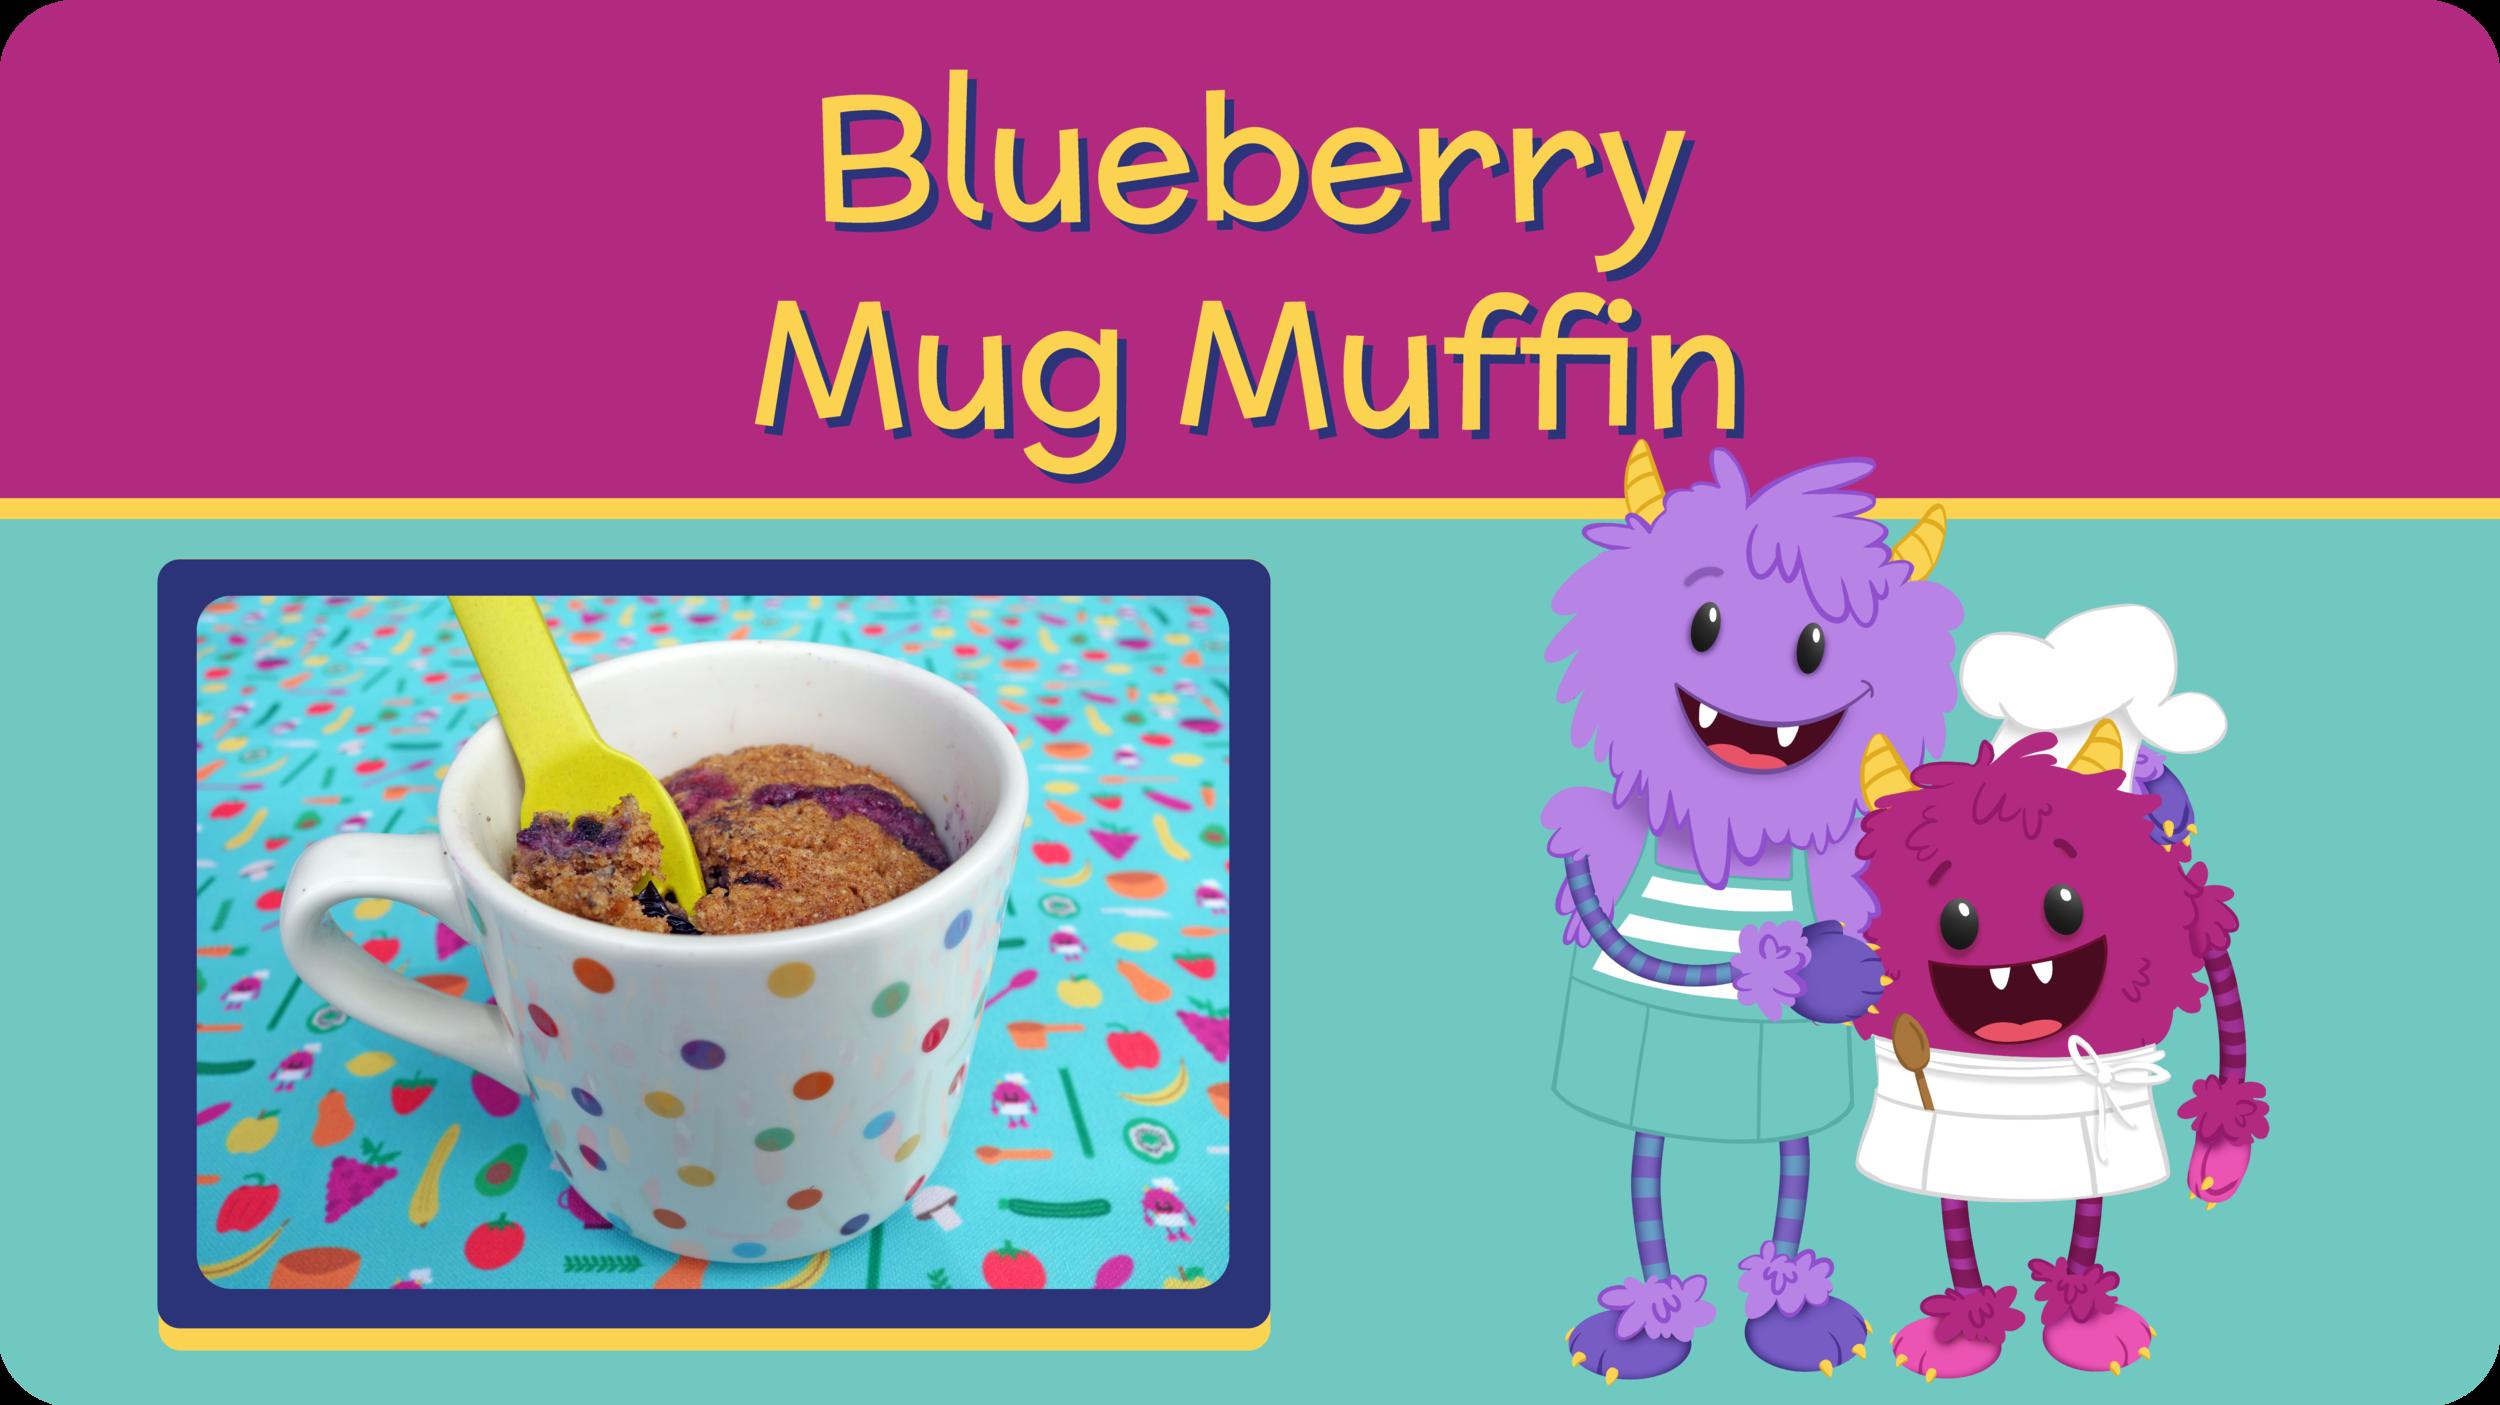 01_BlueberryMugMuffin_Title Page-01.png